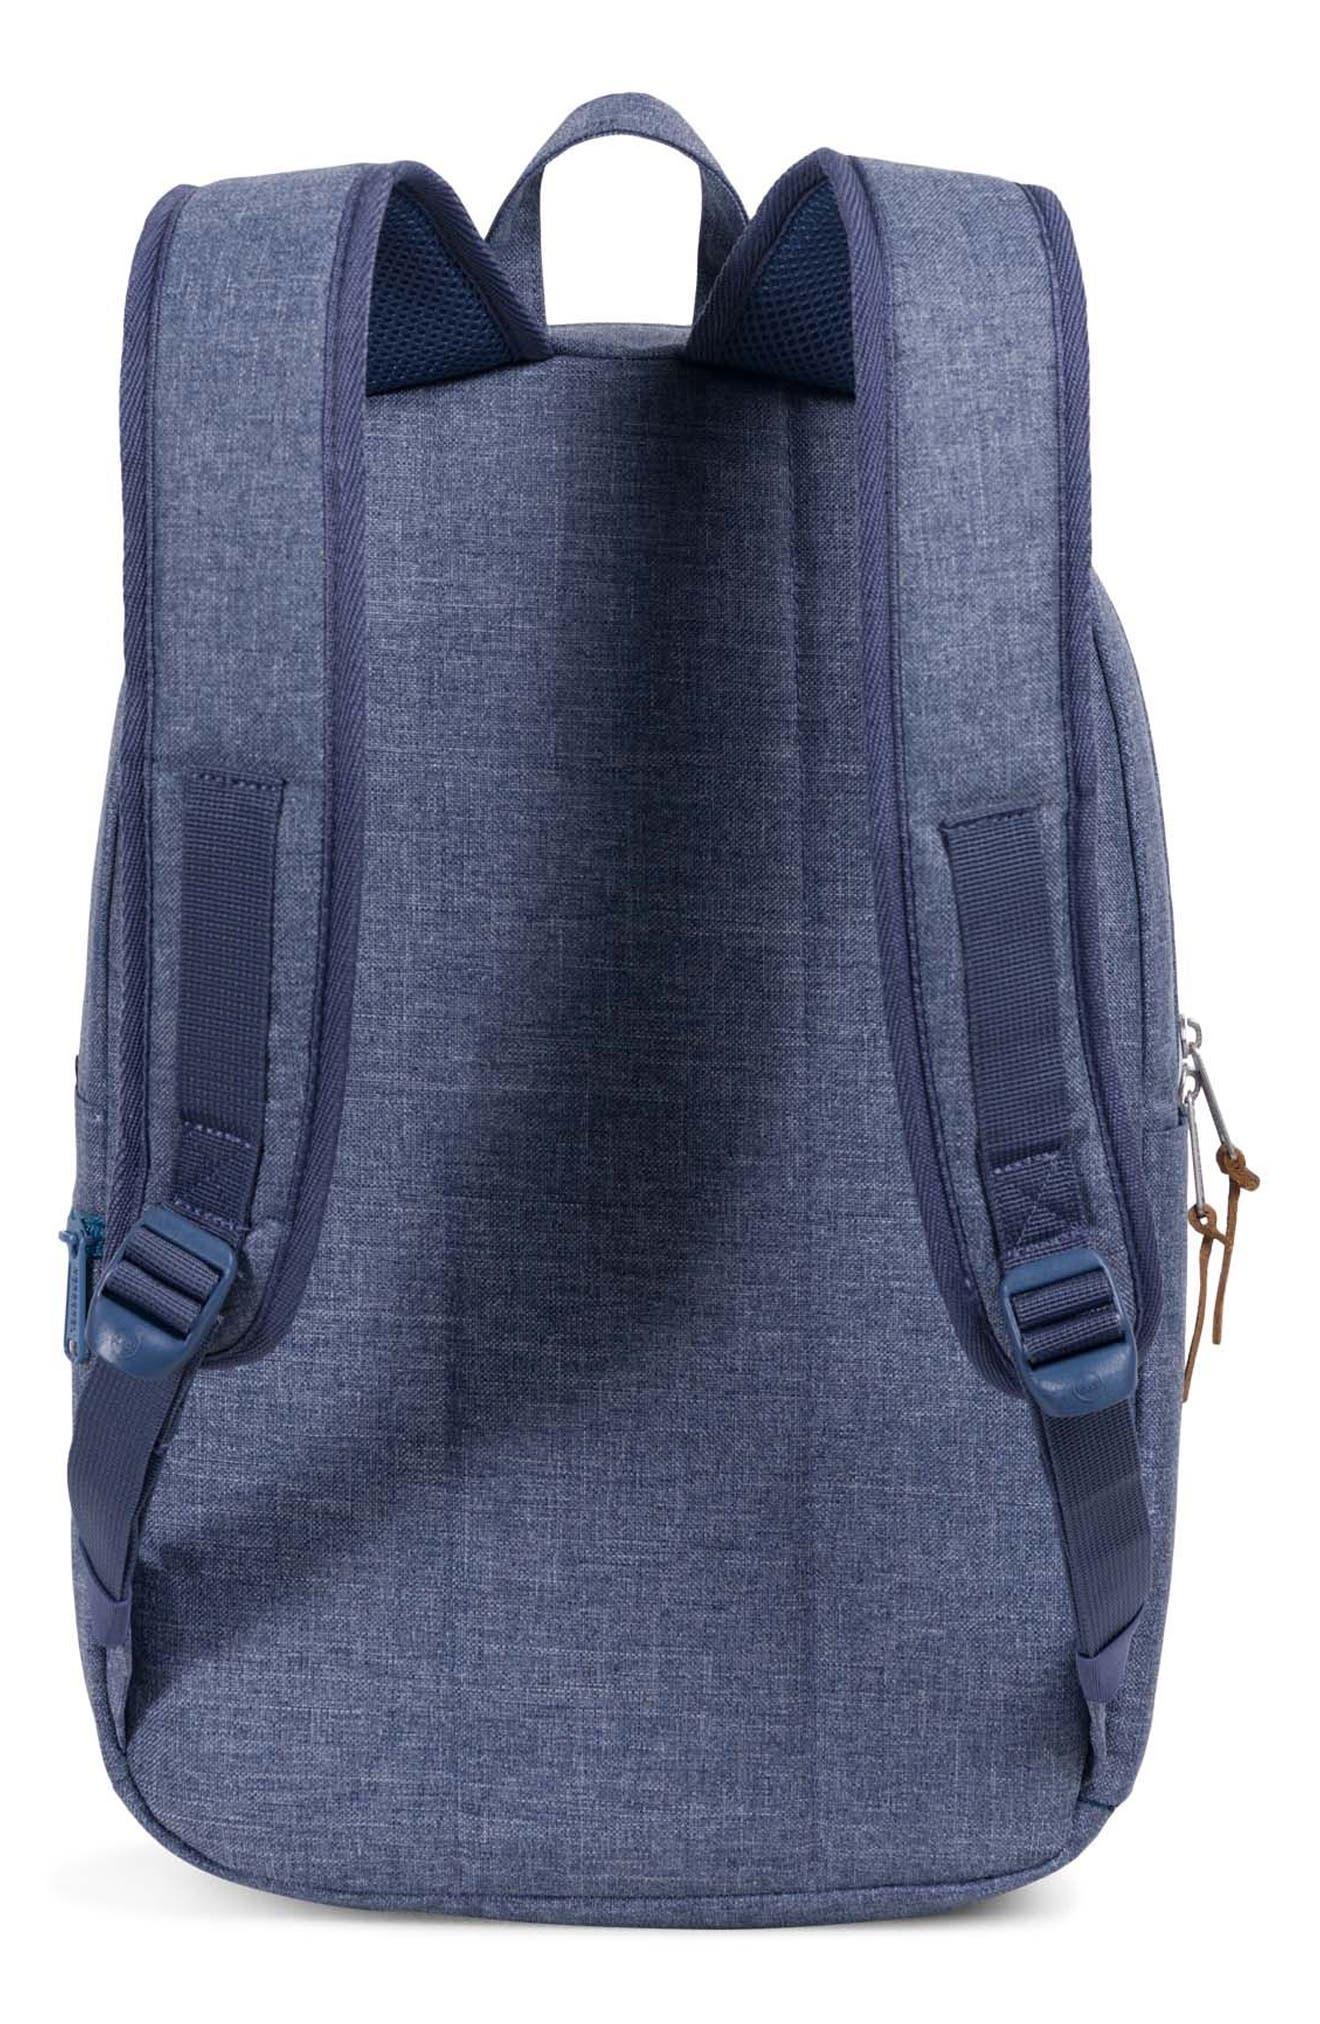 Harrison Backpack,                             Alternate thumbnail 17, color,